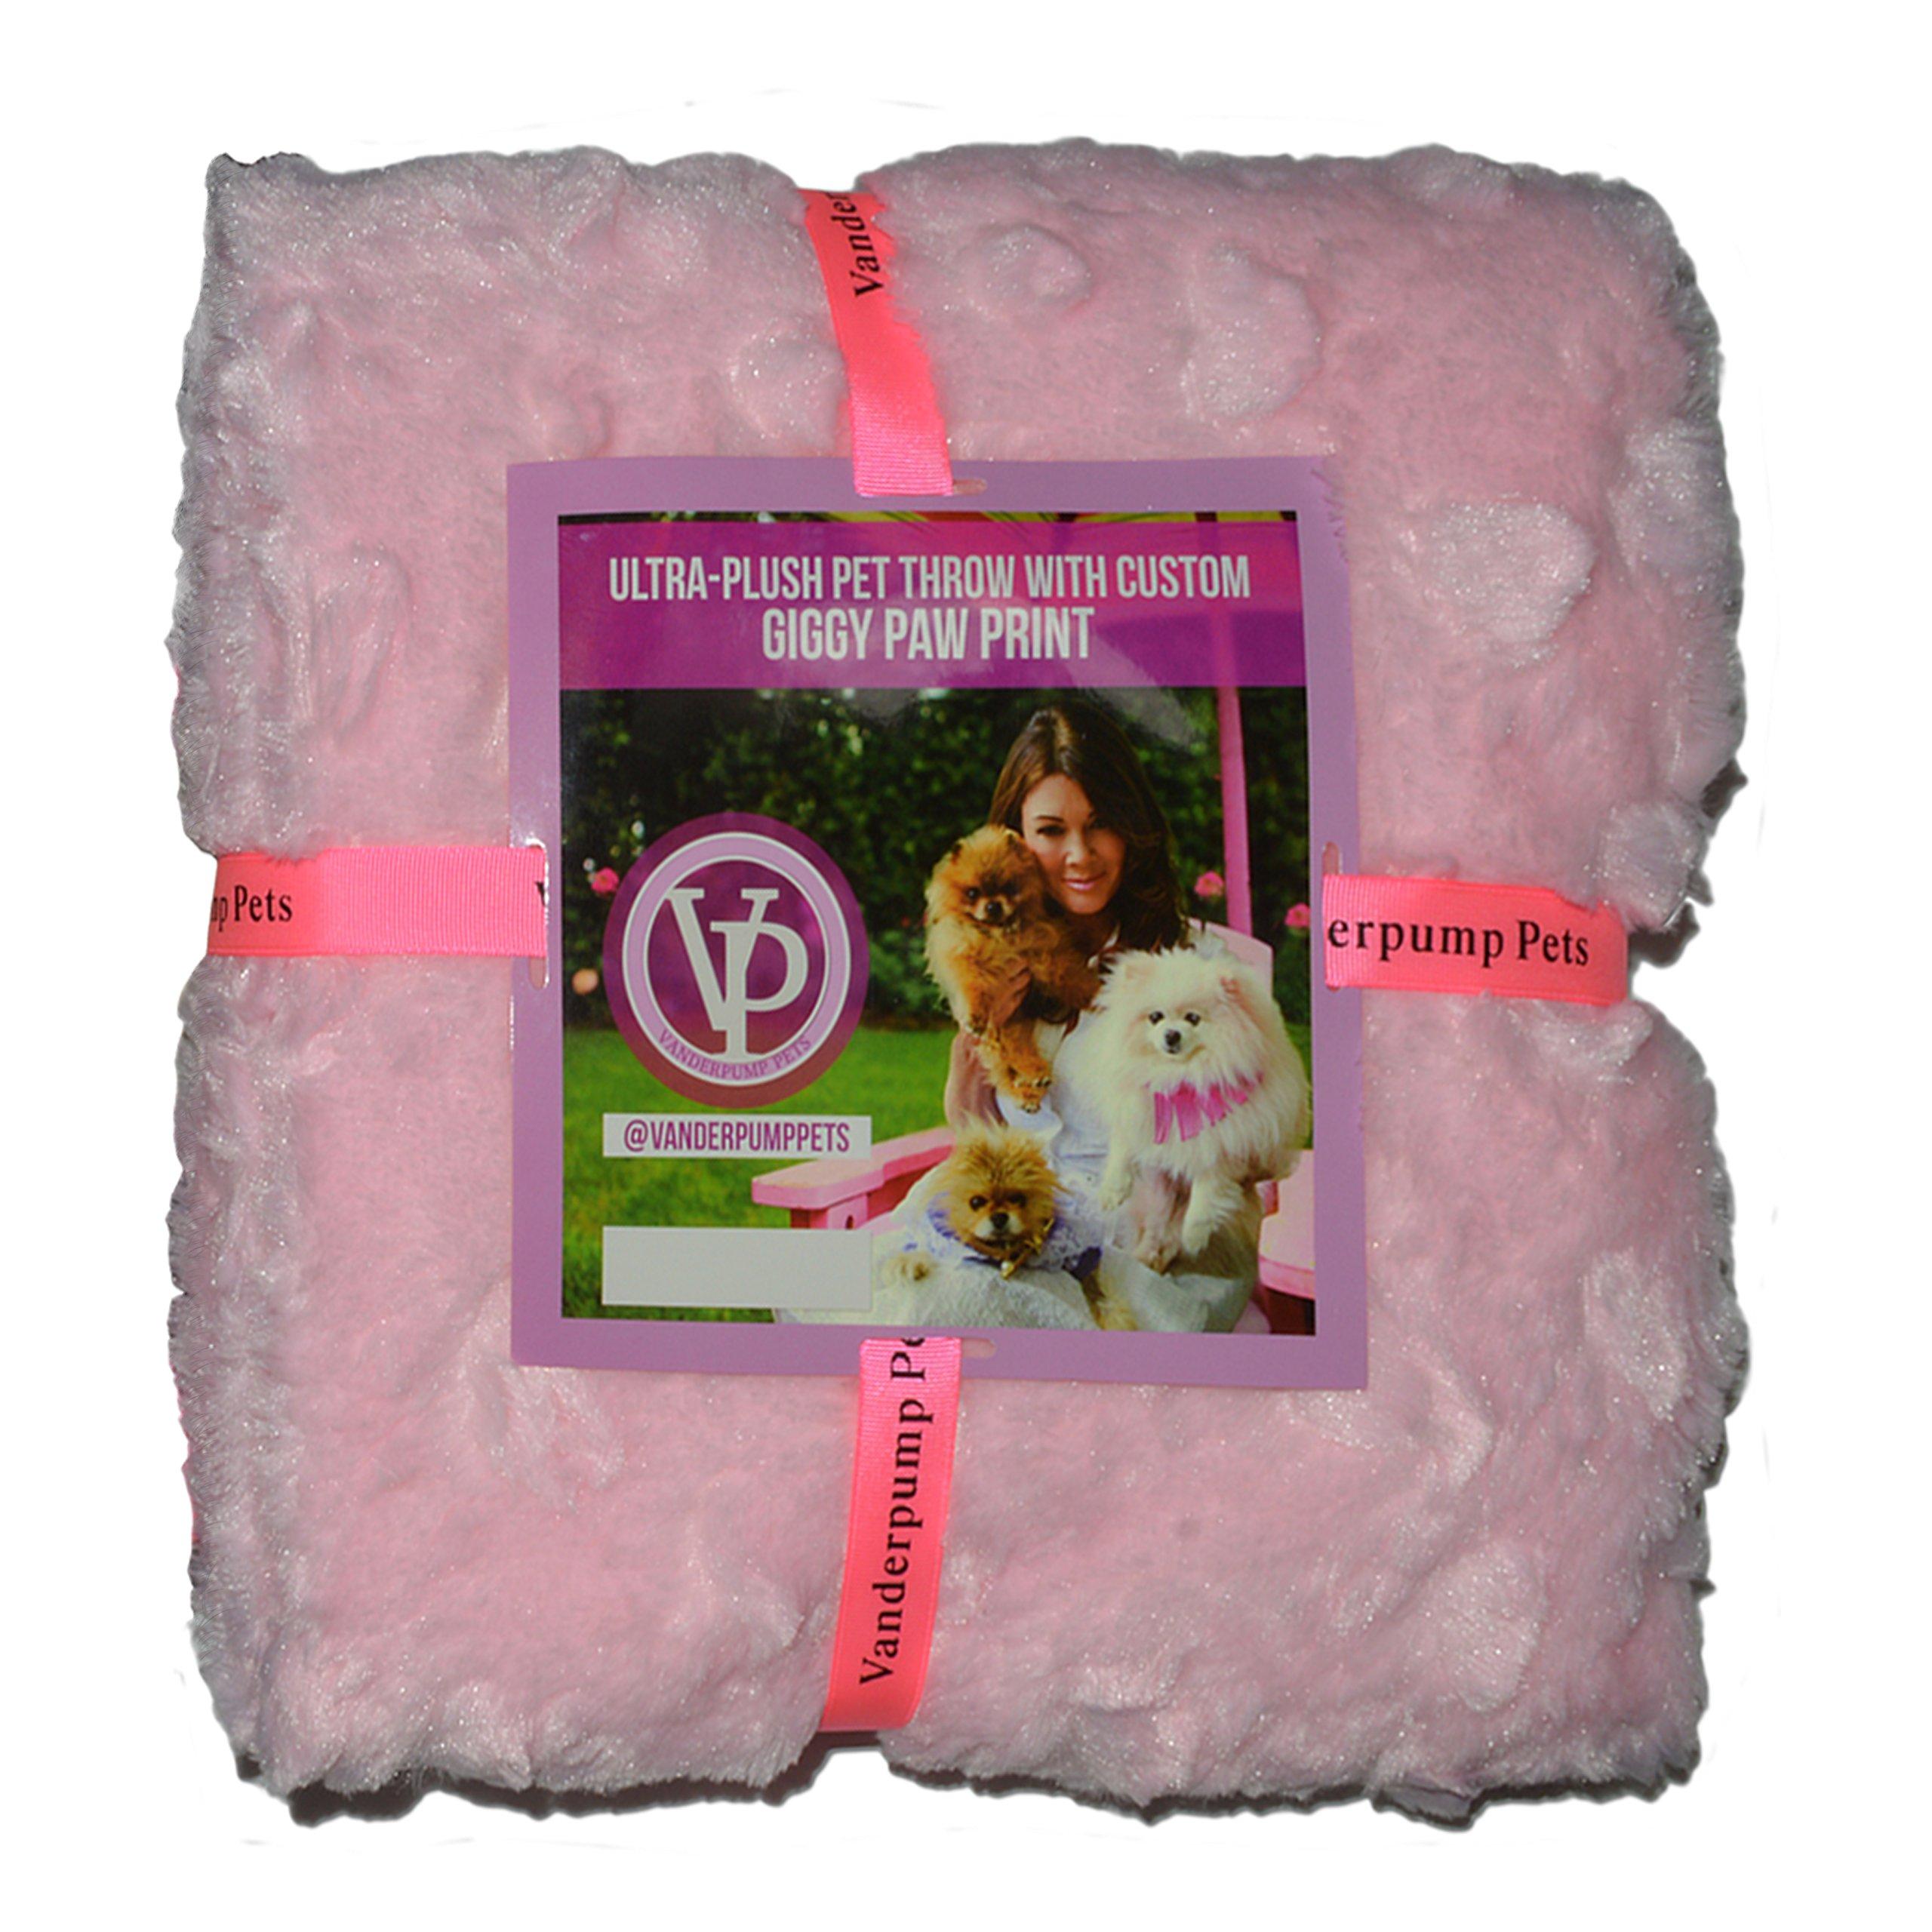 Vanderpump Pets Embroidered Plush Faux Fur Pet Blanket, Pink